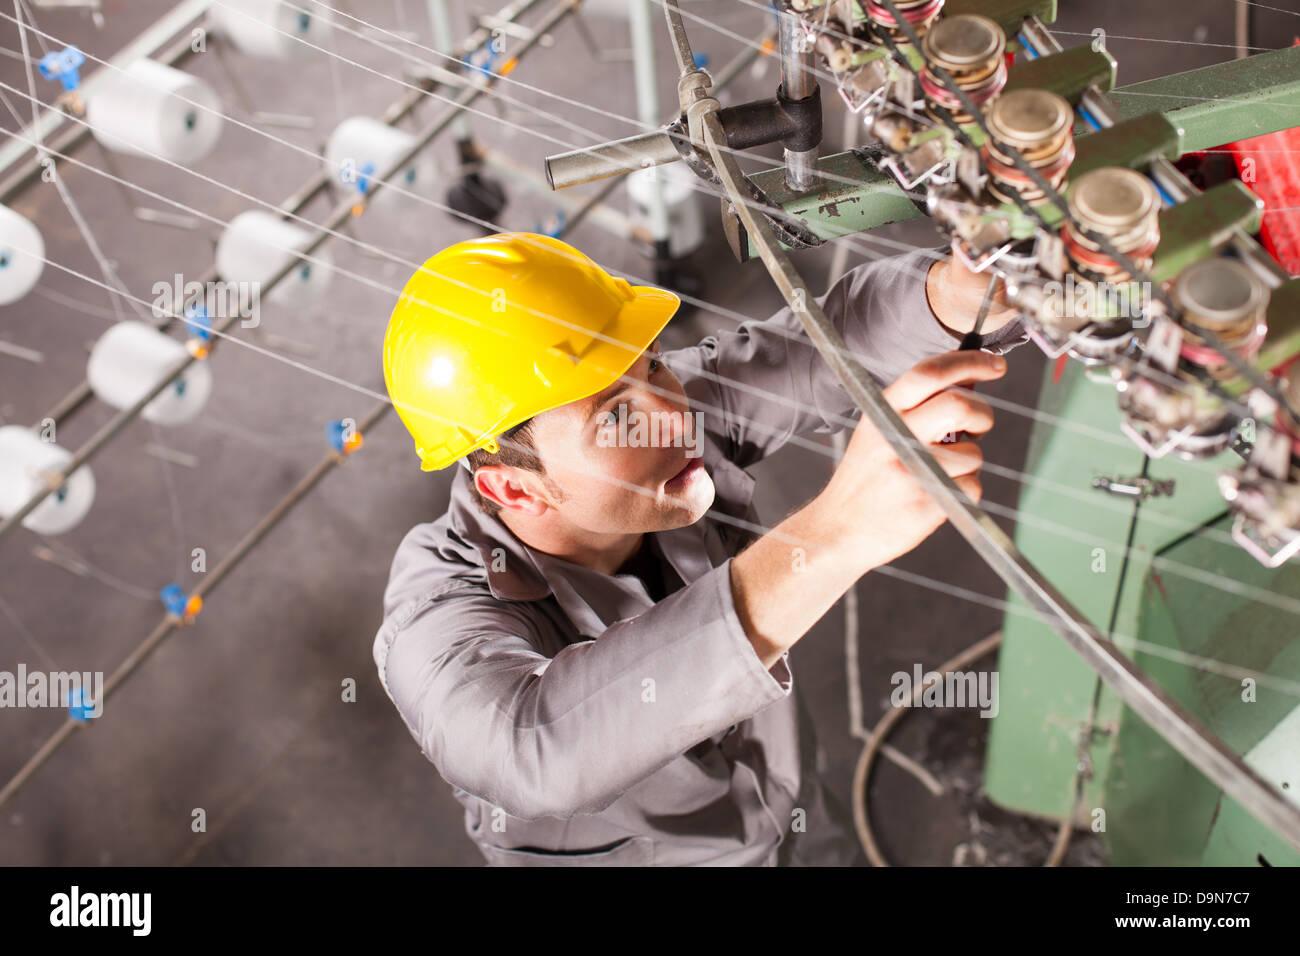 textile company technician repairing weaving machine Stock Photo